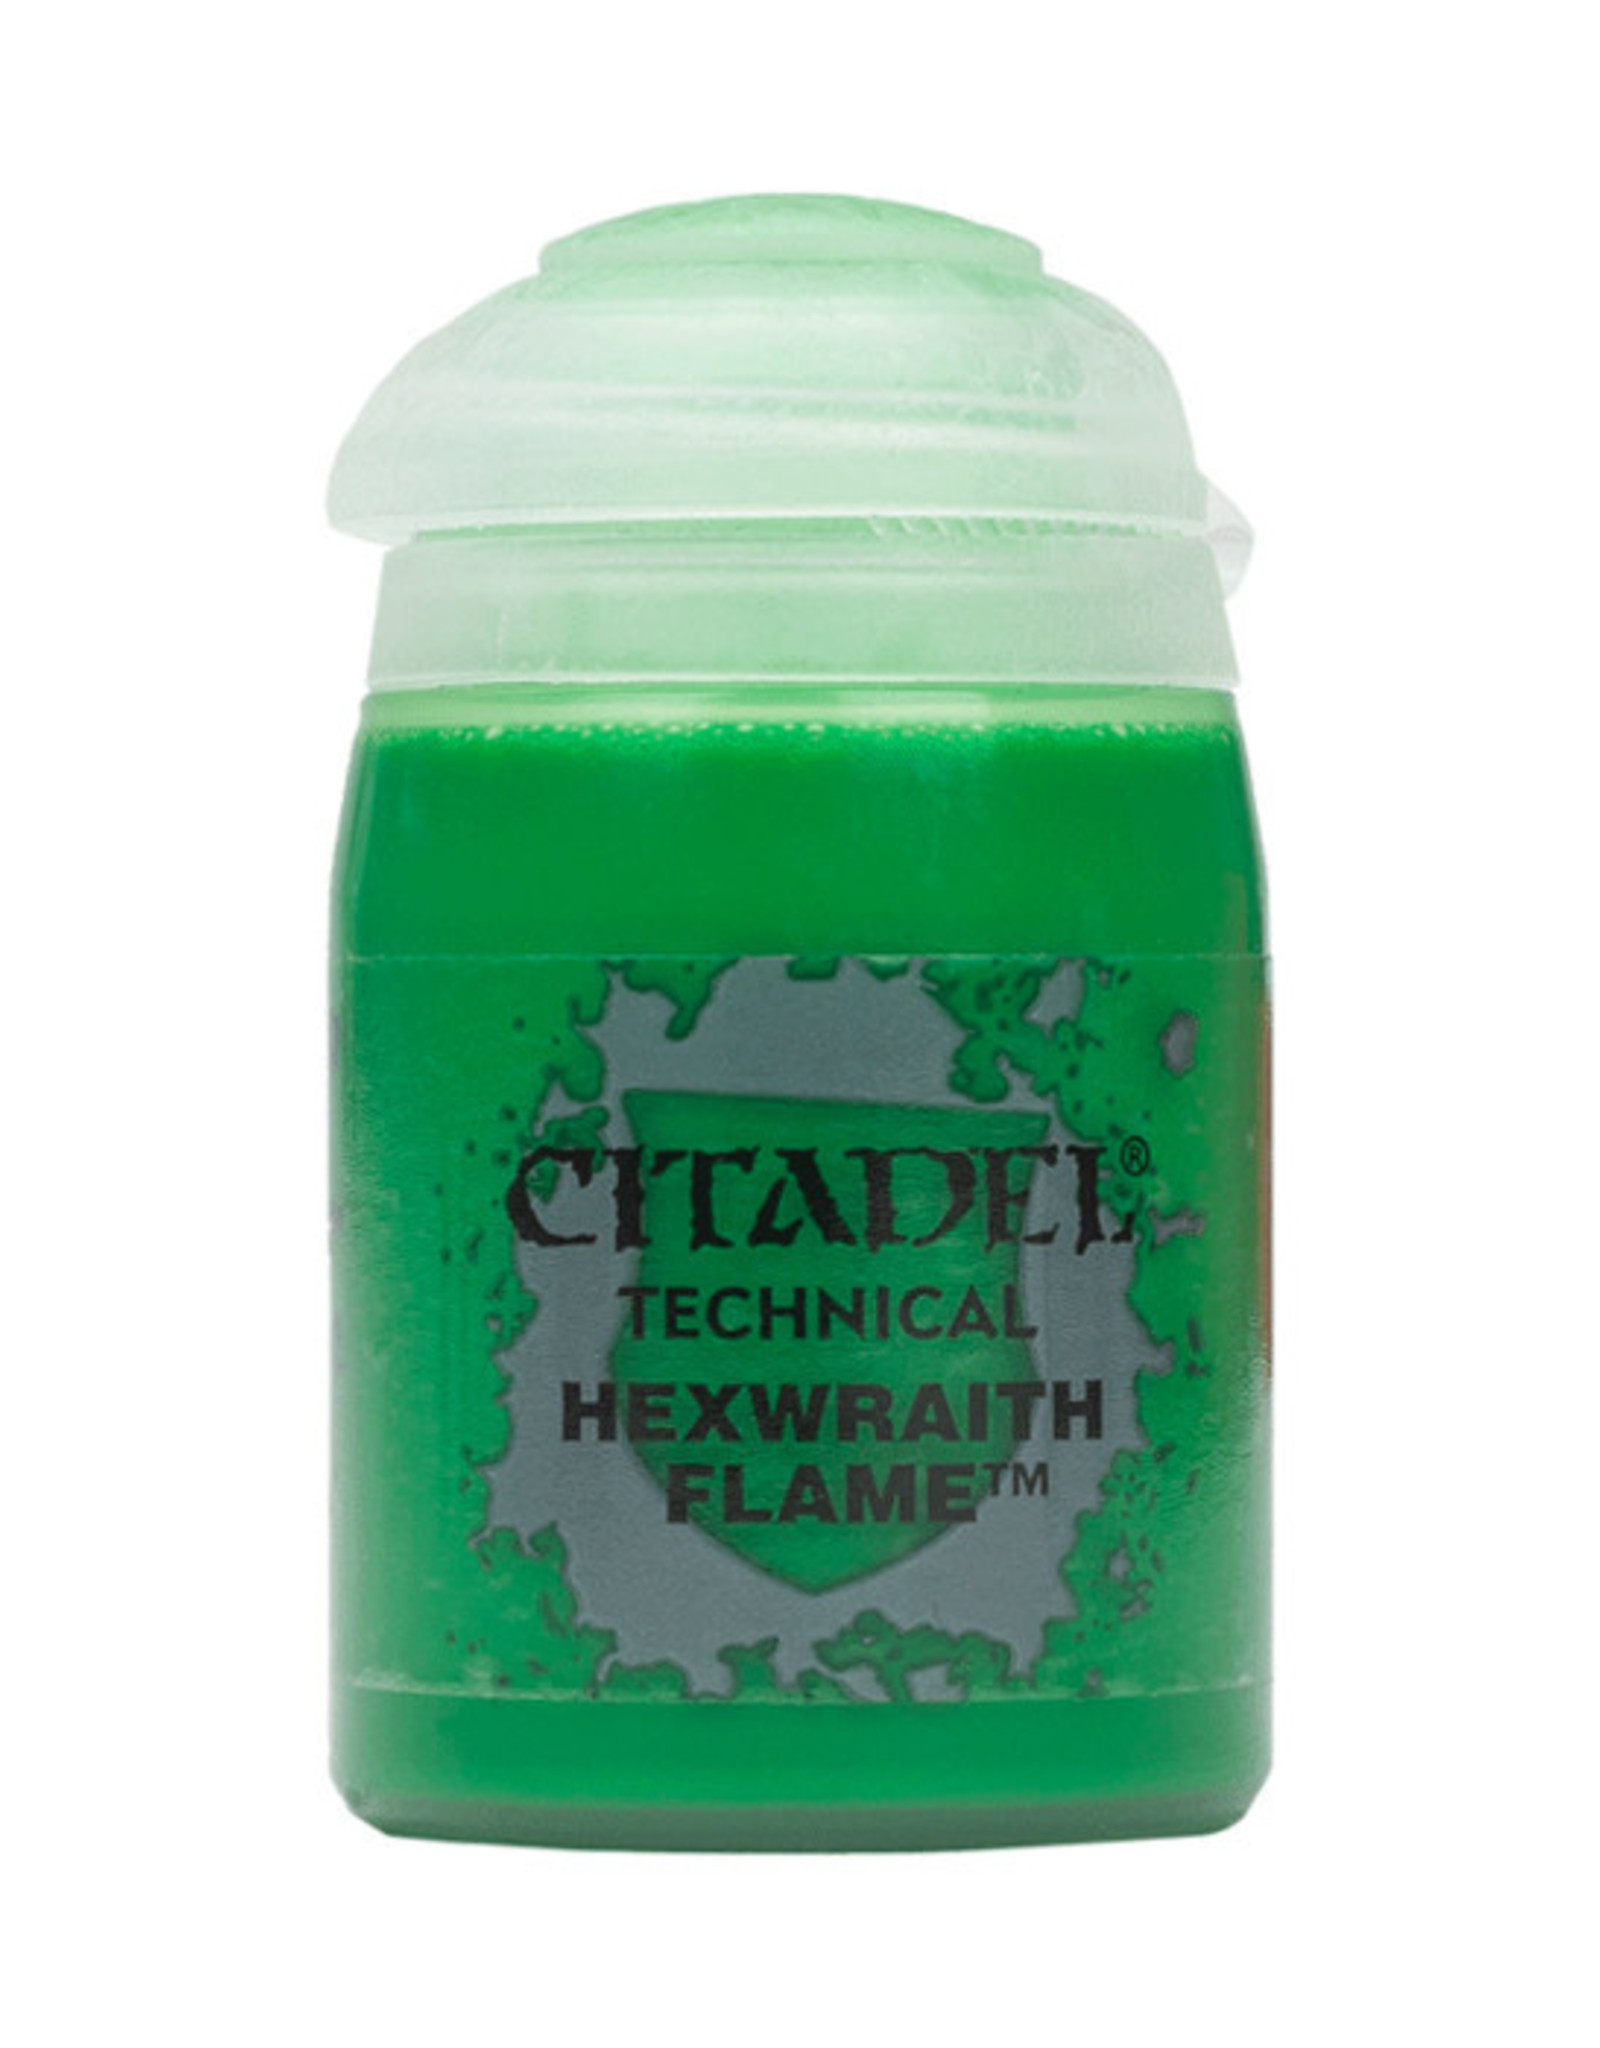 Citadel Citadel Colour: Technical - Hexwraith Flame